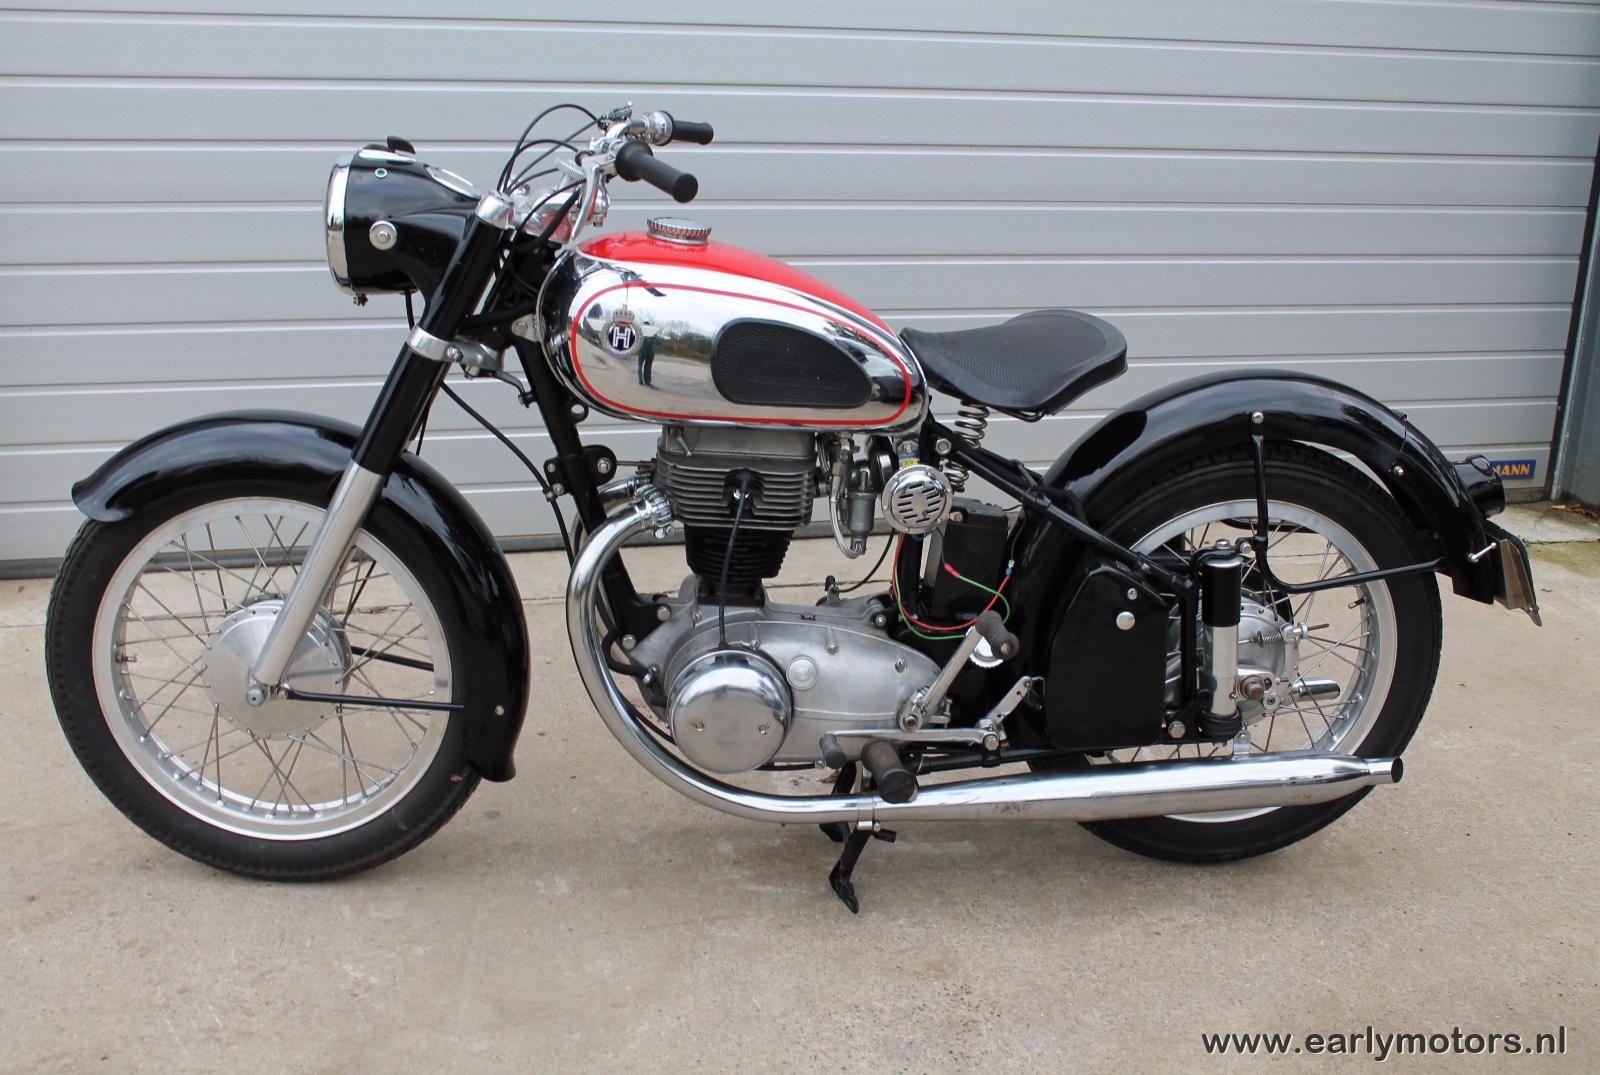 horex regina 400 motorcycles motorcycle motorcycle. Black Bedroom Furniture Sets. Home Design Ideas